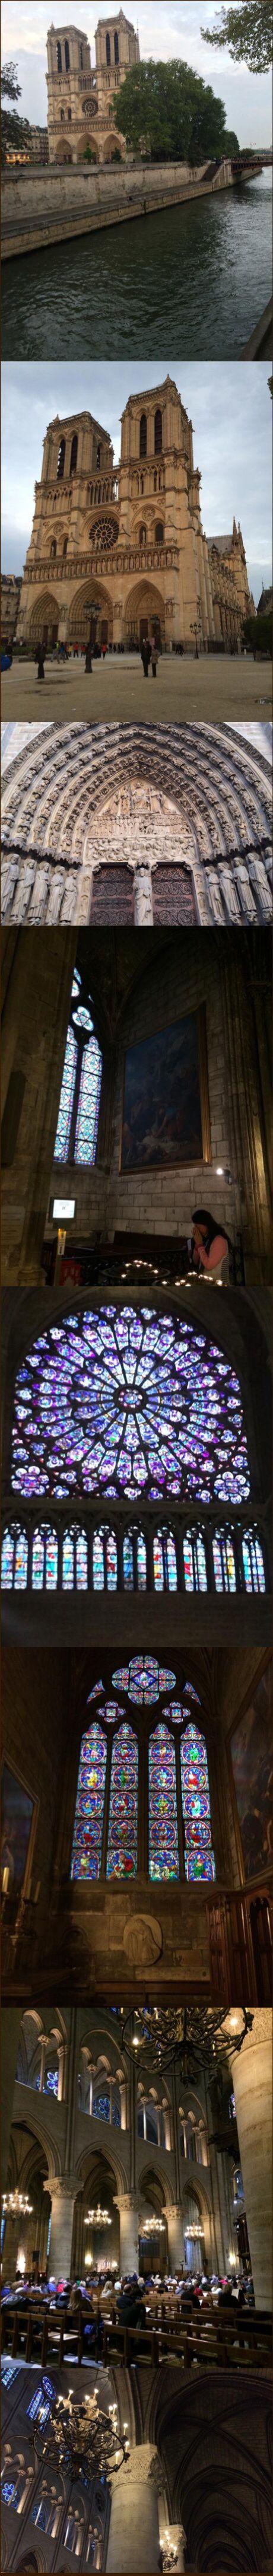 Notre Dame Church. By: Carolina Serrano